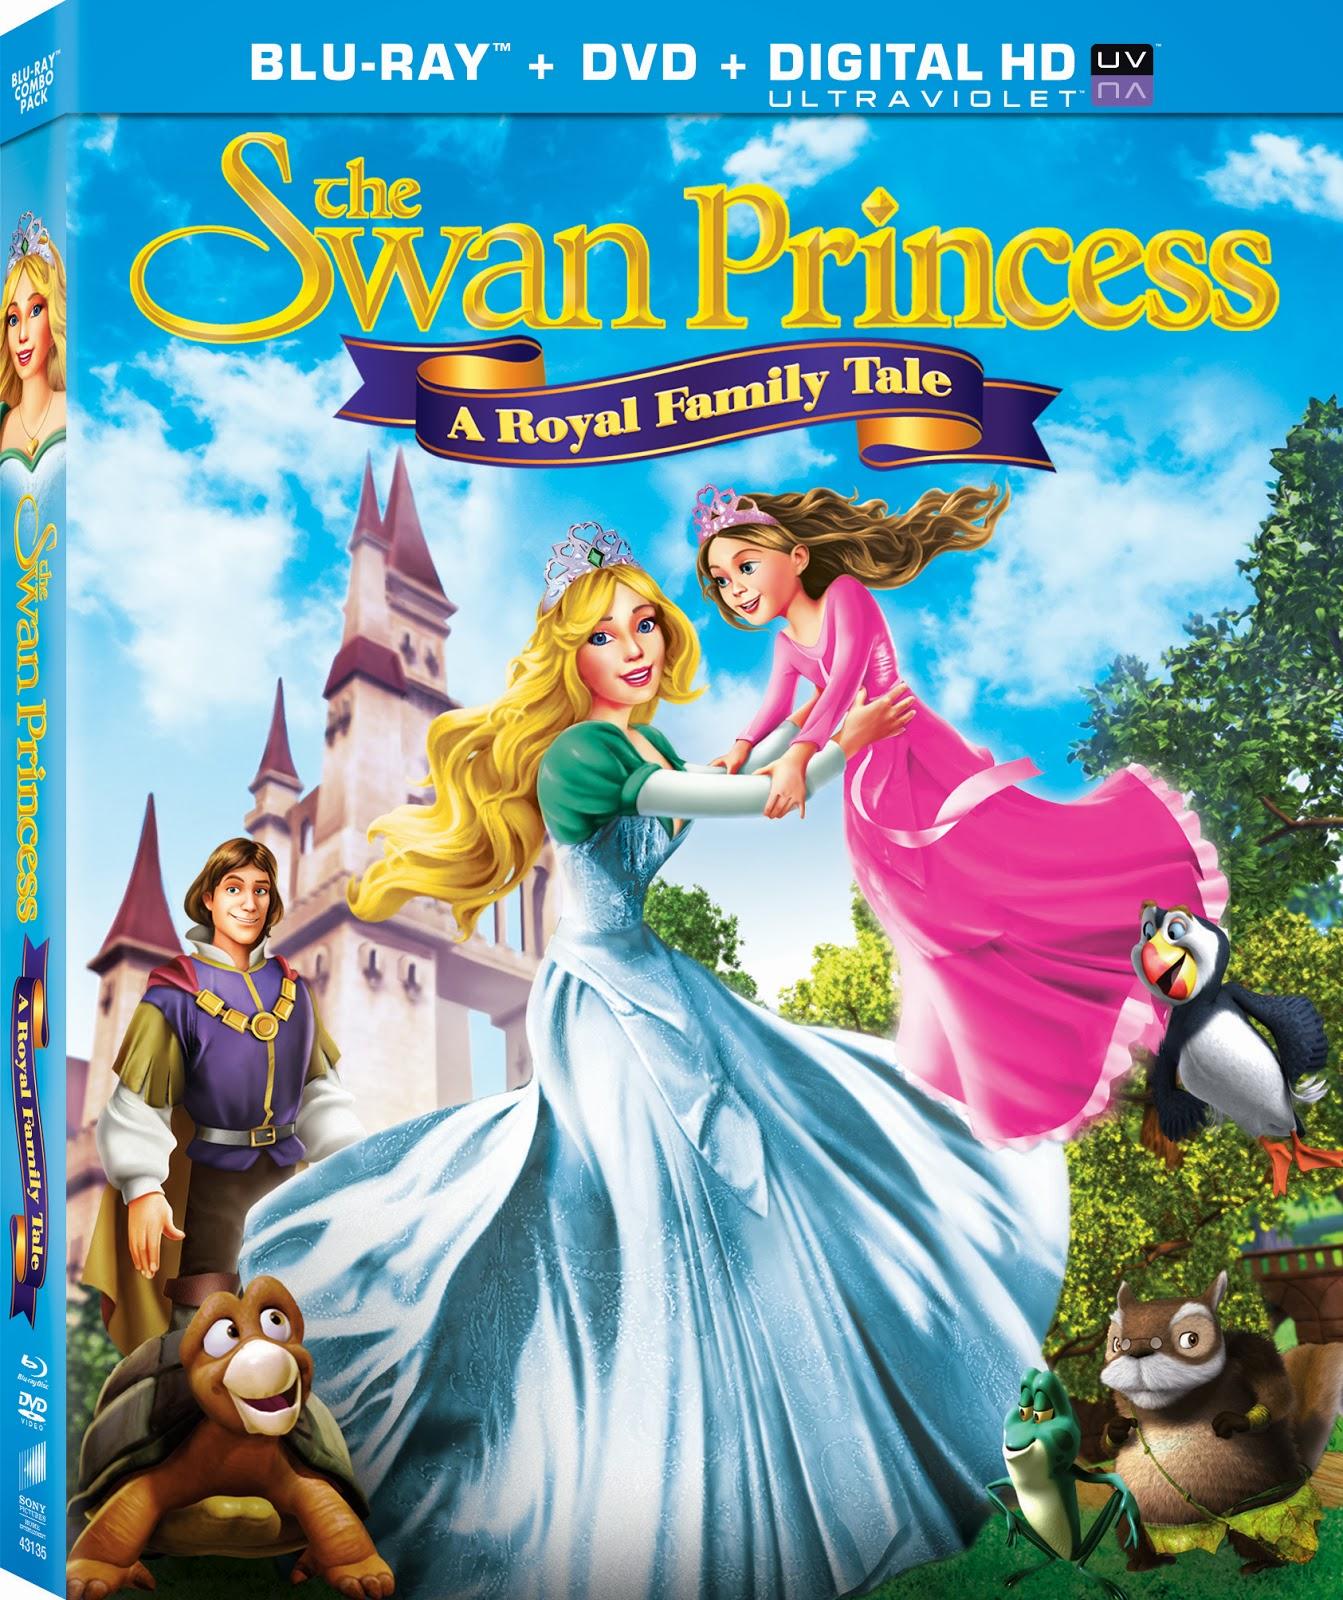 The swan princess a royal family tale the swan princess wiki